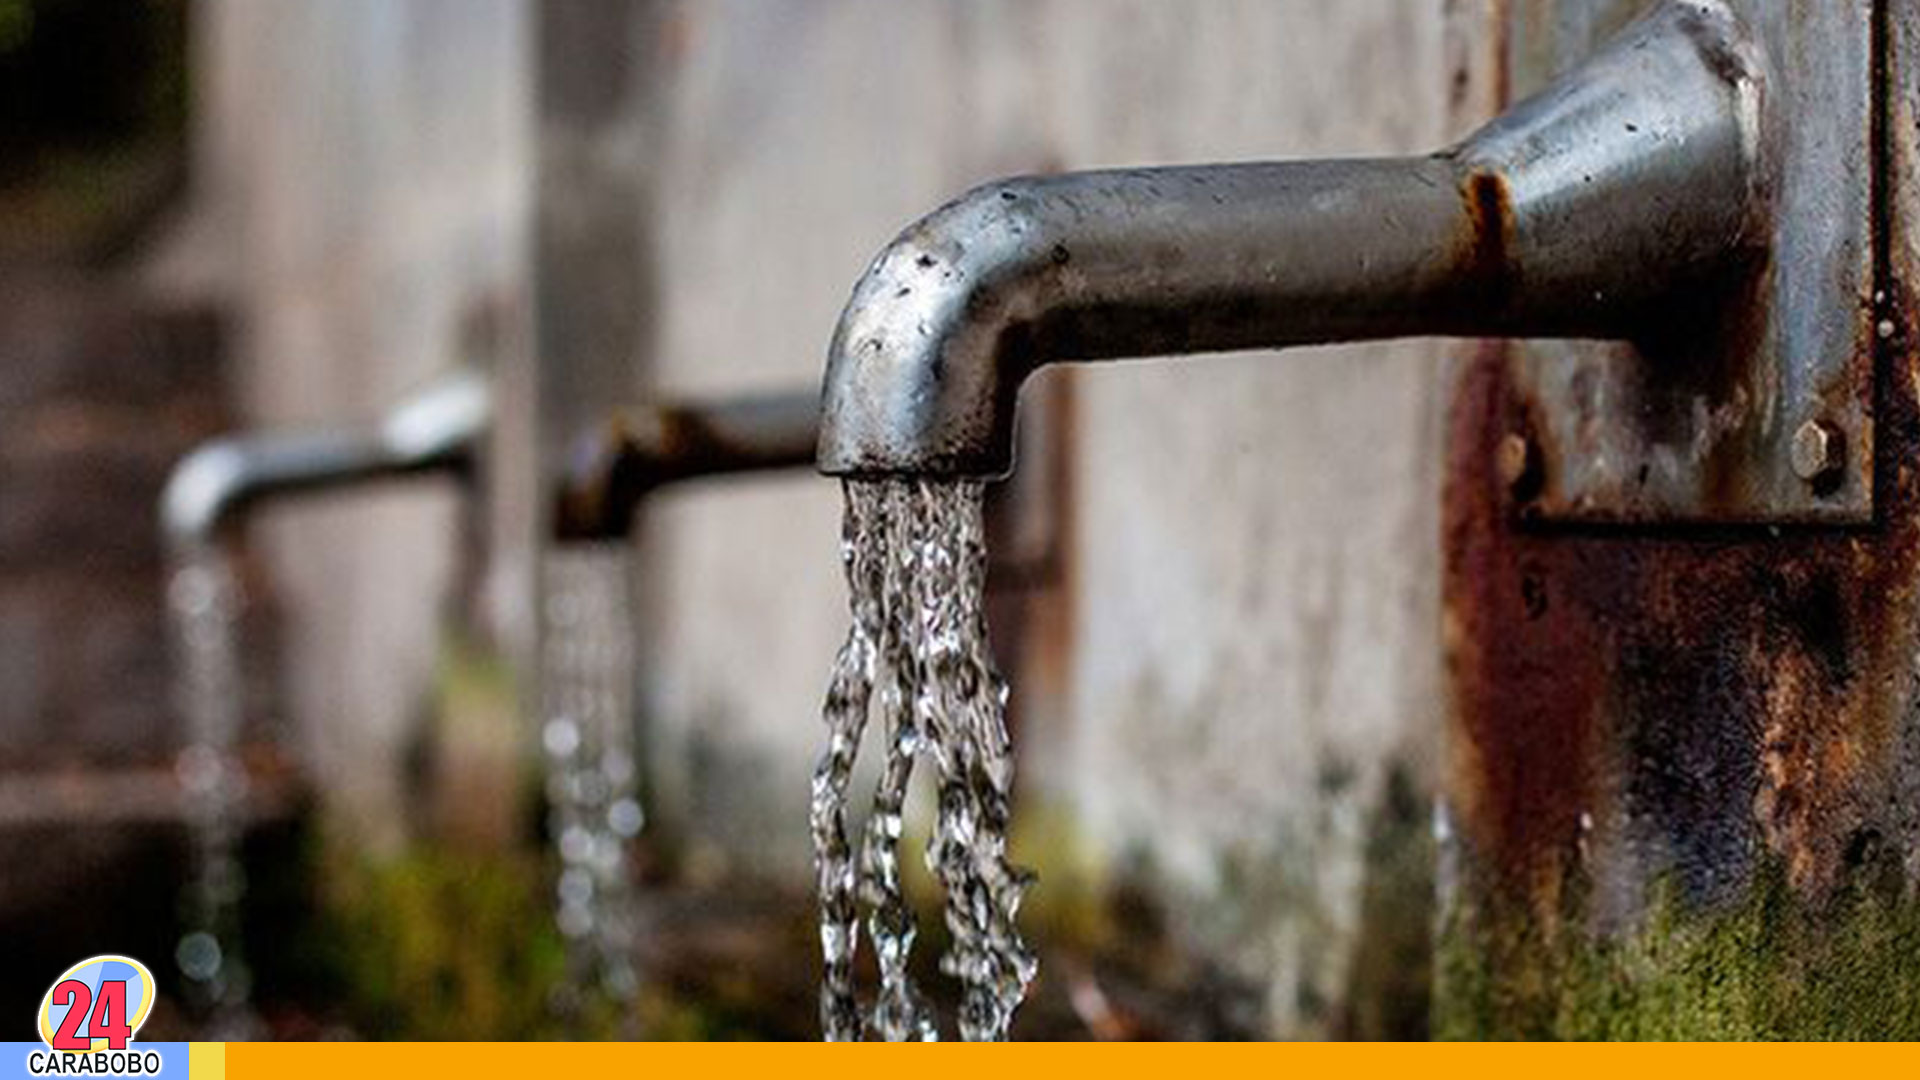 Tomas Ilegales de agua - Tomas Ilegales de agua